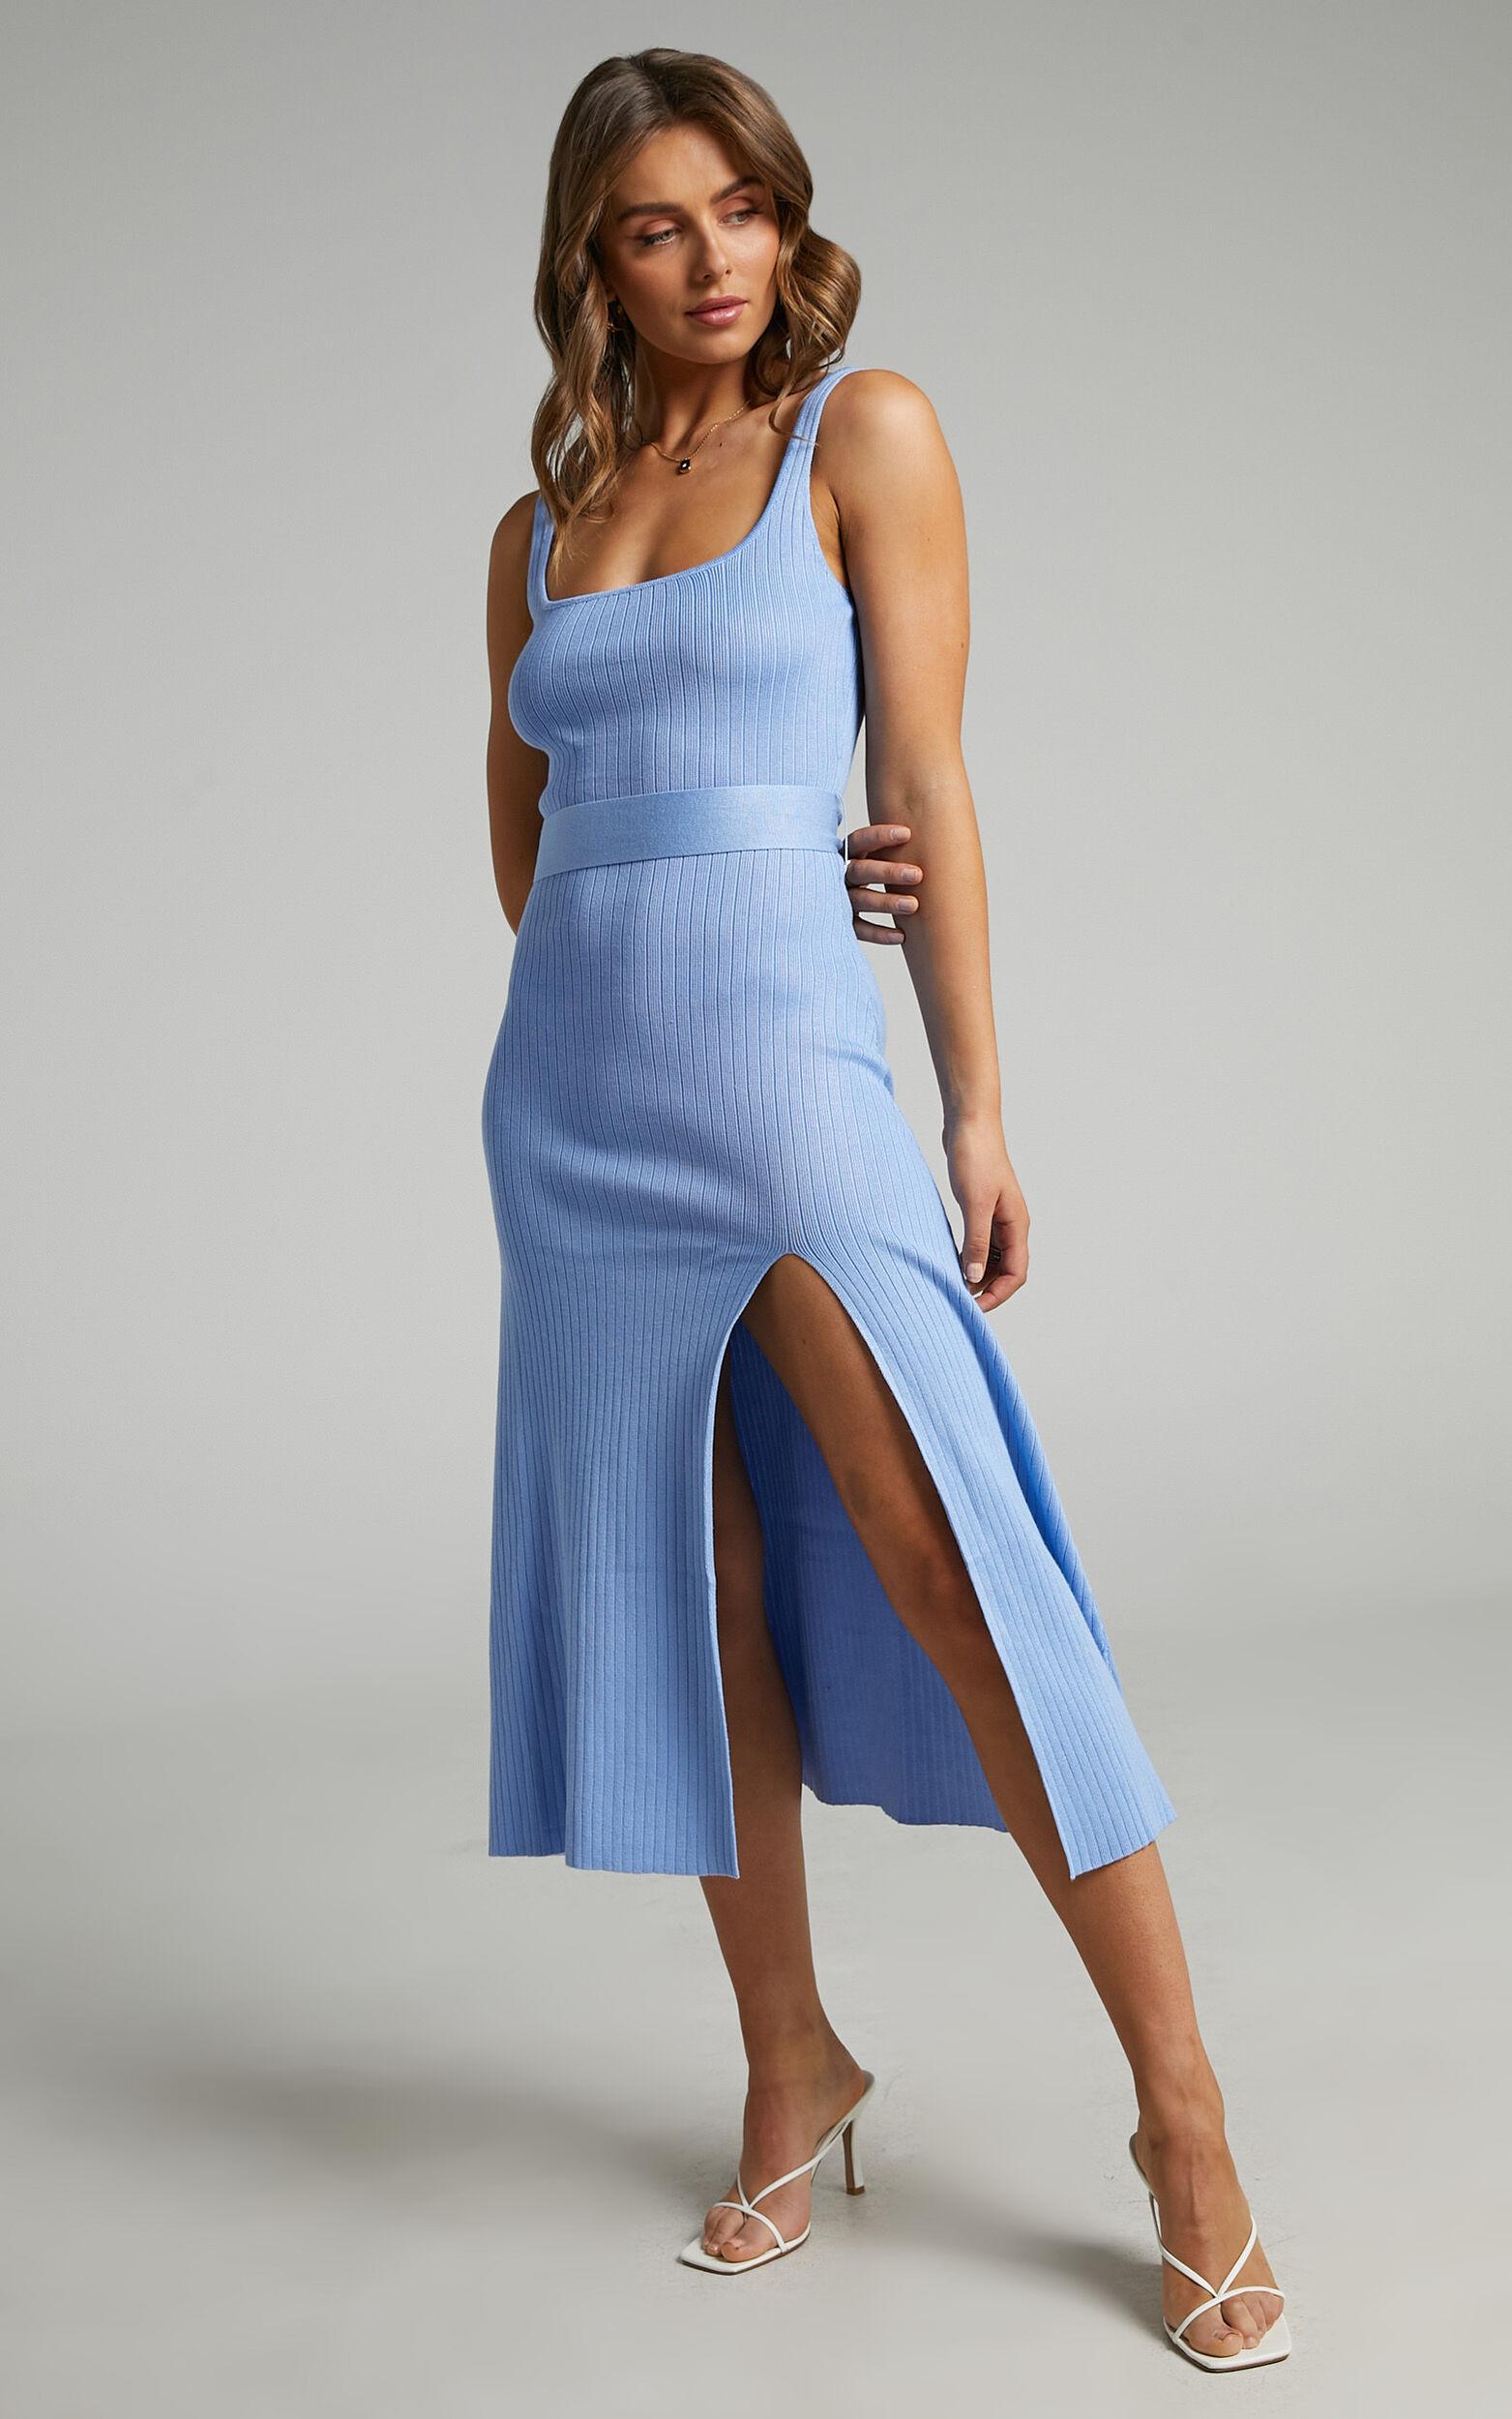 Cinnia Belted Knit Midi Dress in Cornflower Blue - 04, BLU1, super-hi-res image number null